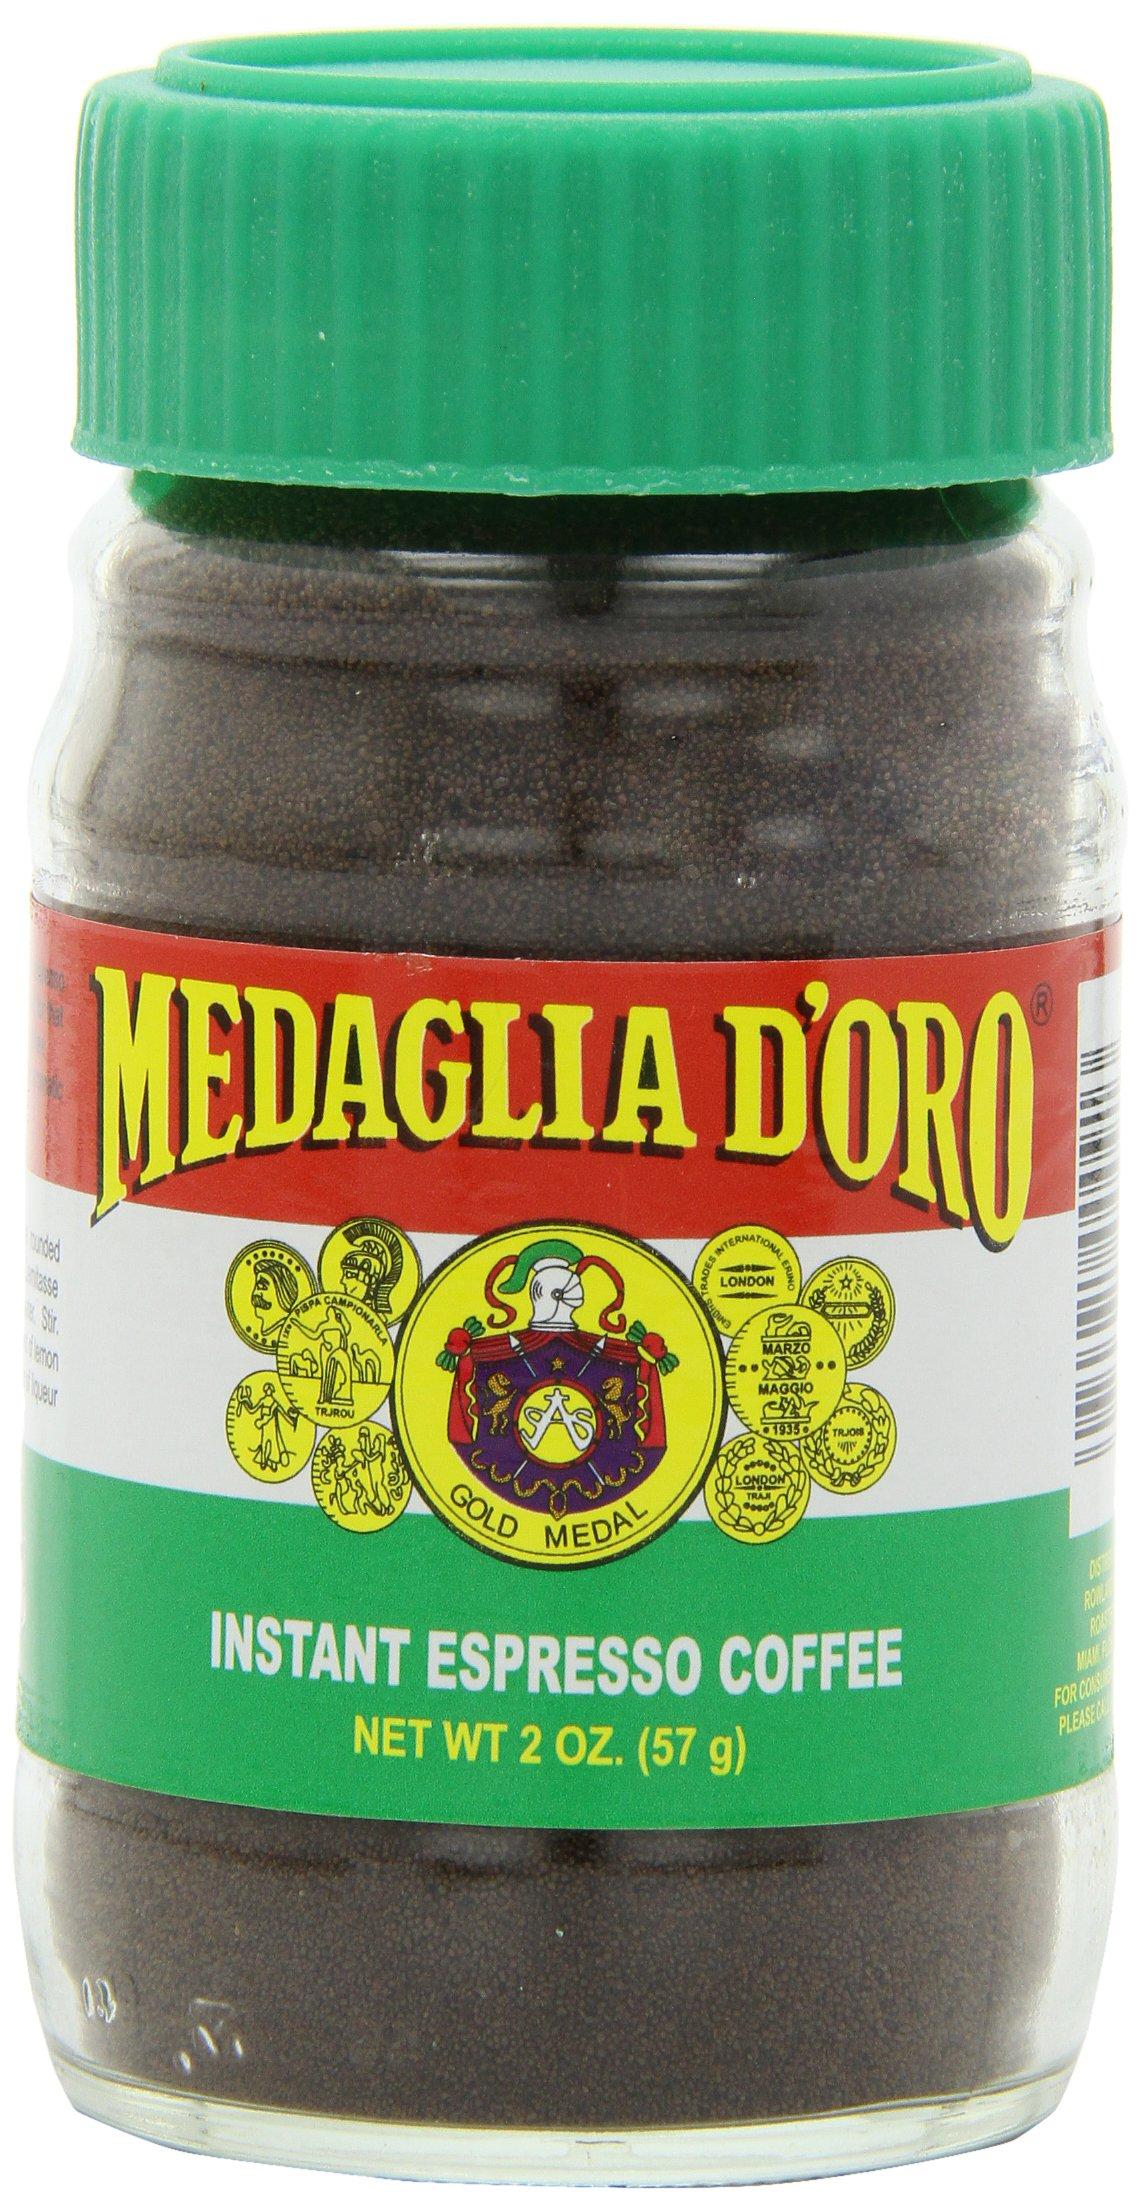 Medaglia D'Oro Instant Espresso Coffee, 2 Ounce (Pack of 12) by MEDAGLIA D'ORO